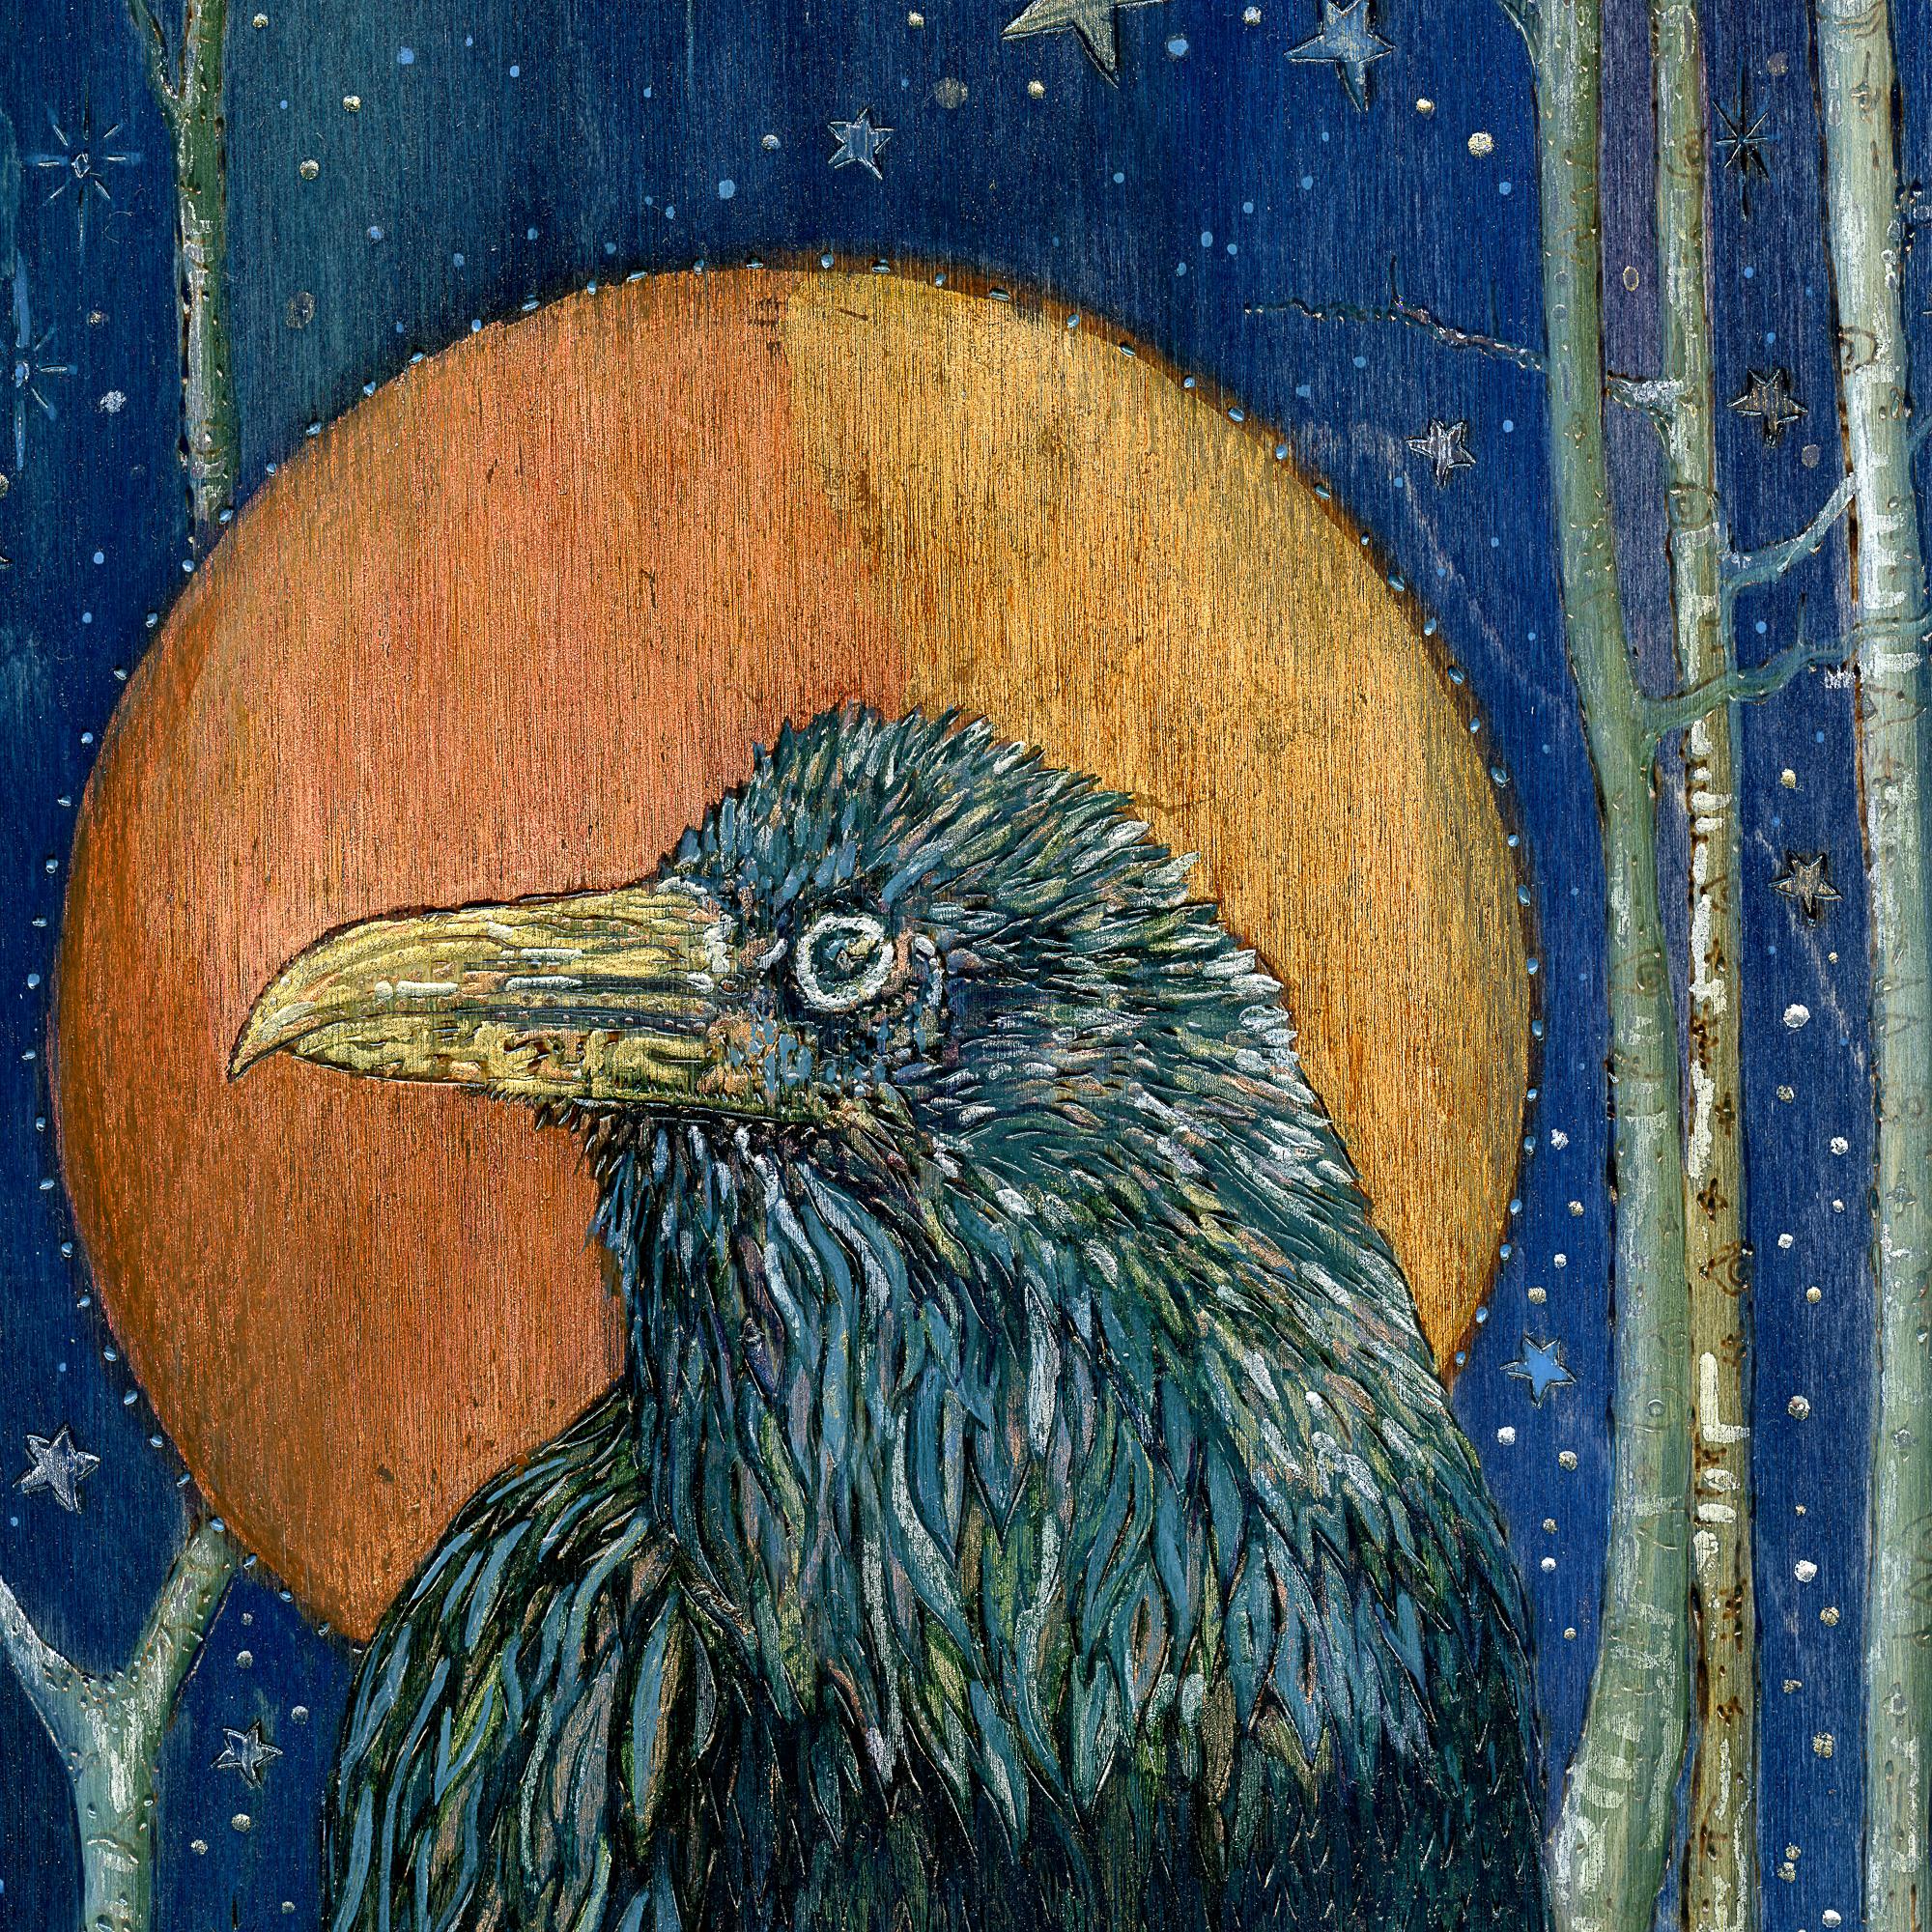 Crow - In Progress